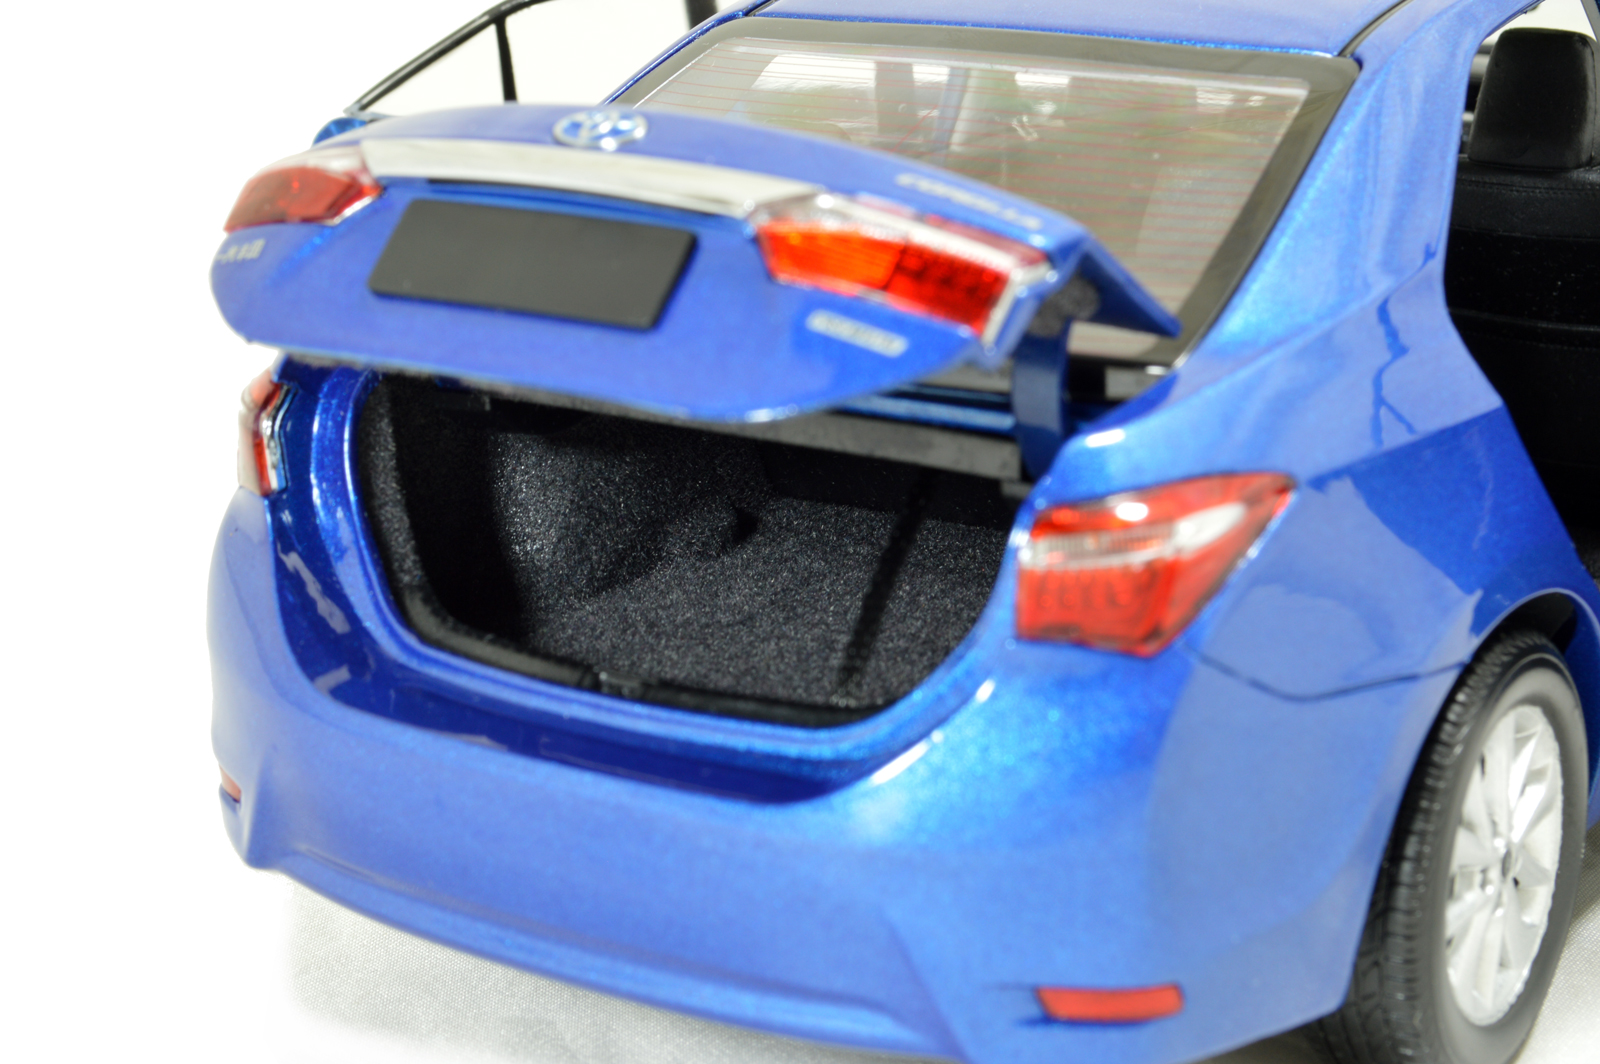 Toyota Corolla 2014 1 18 Scale Diecast Model Car Wholesale